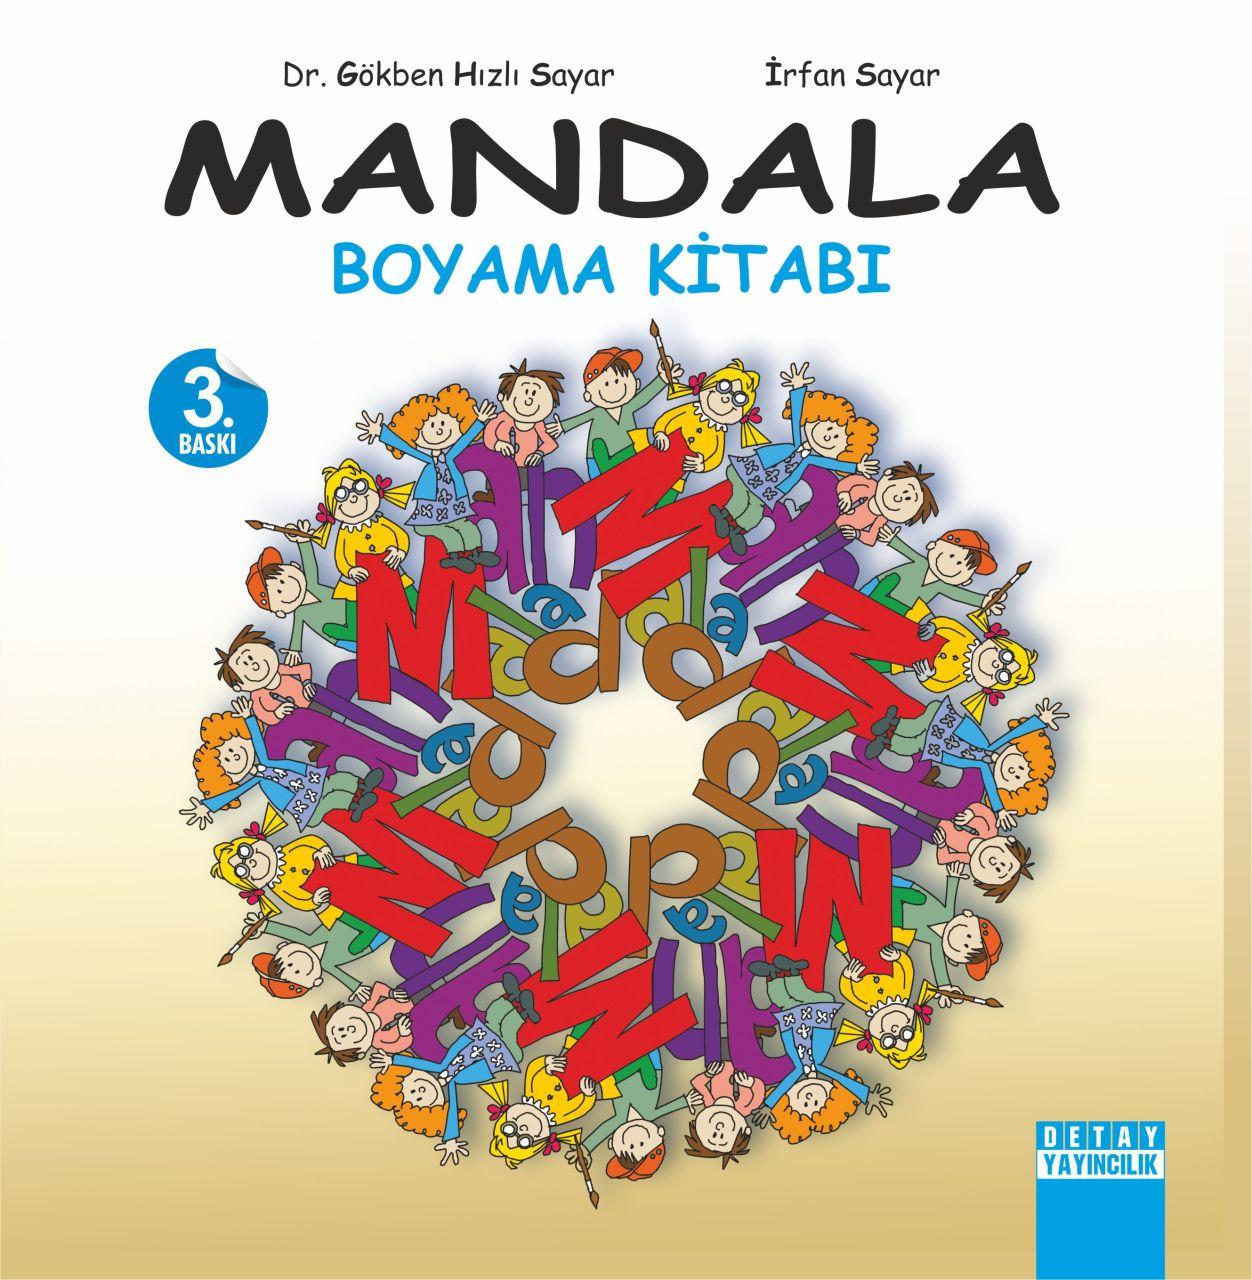 Mandala Boyama Kitabi